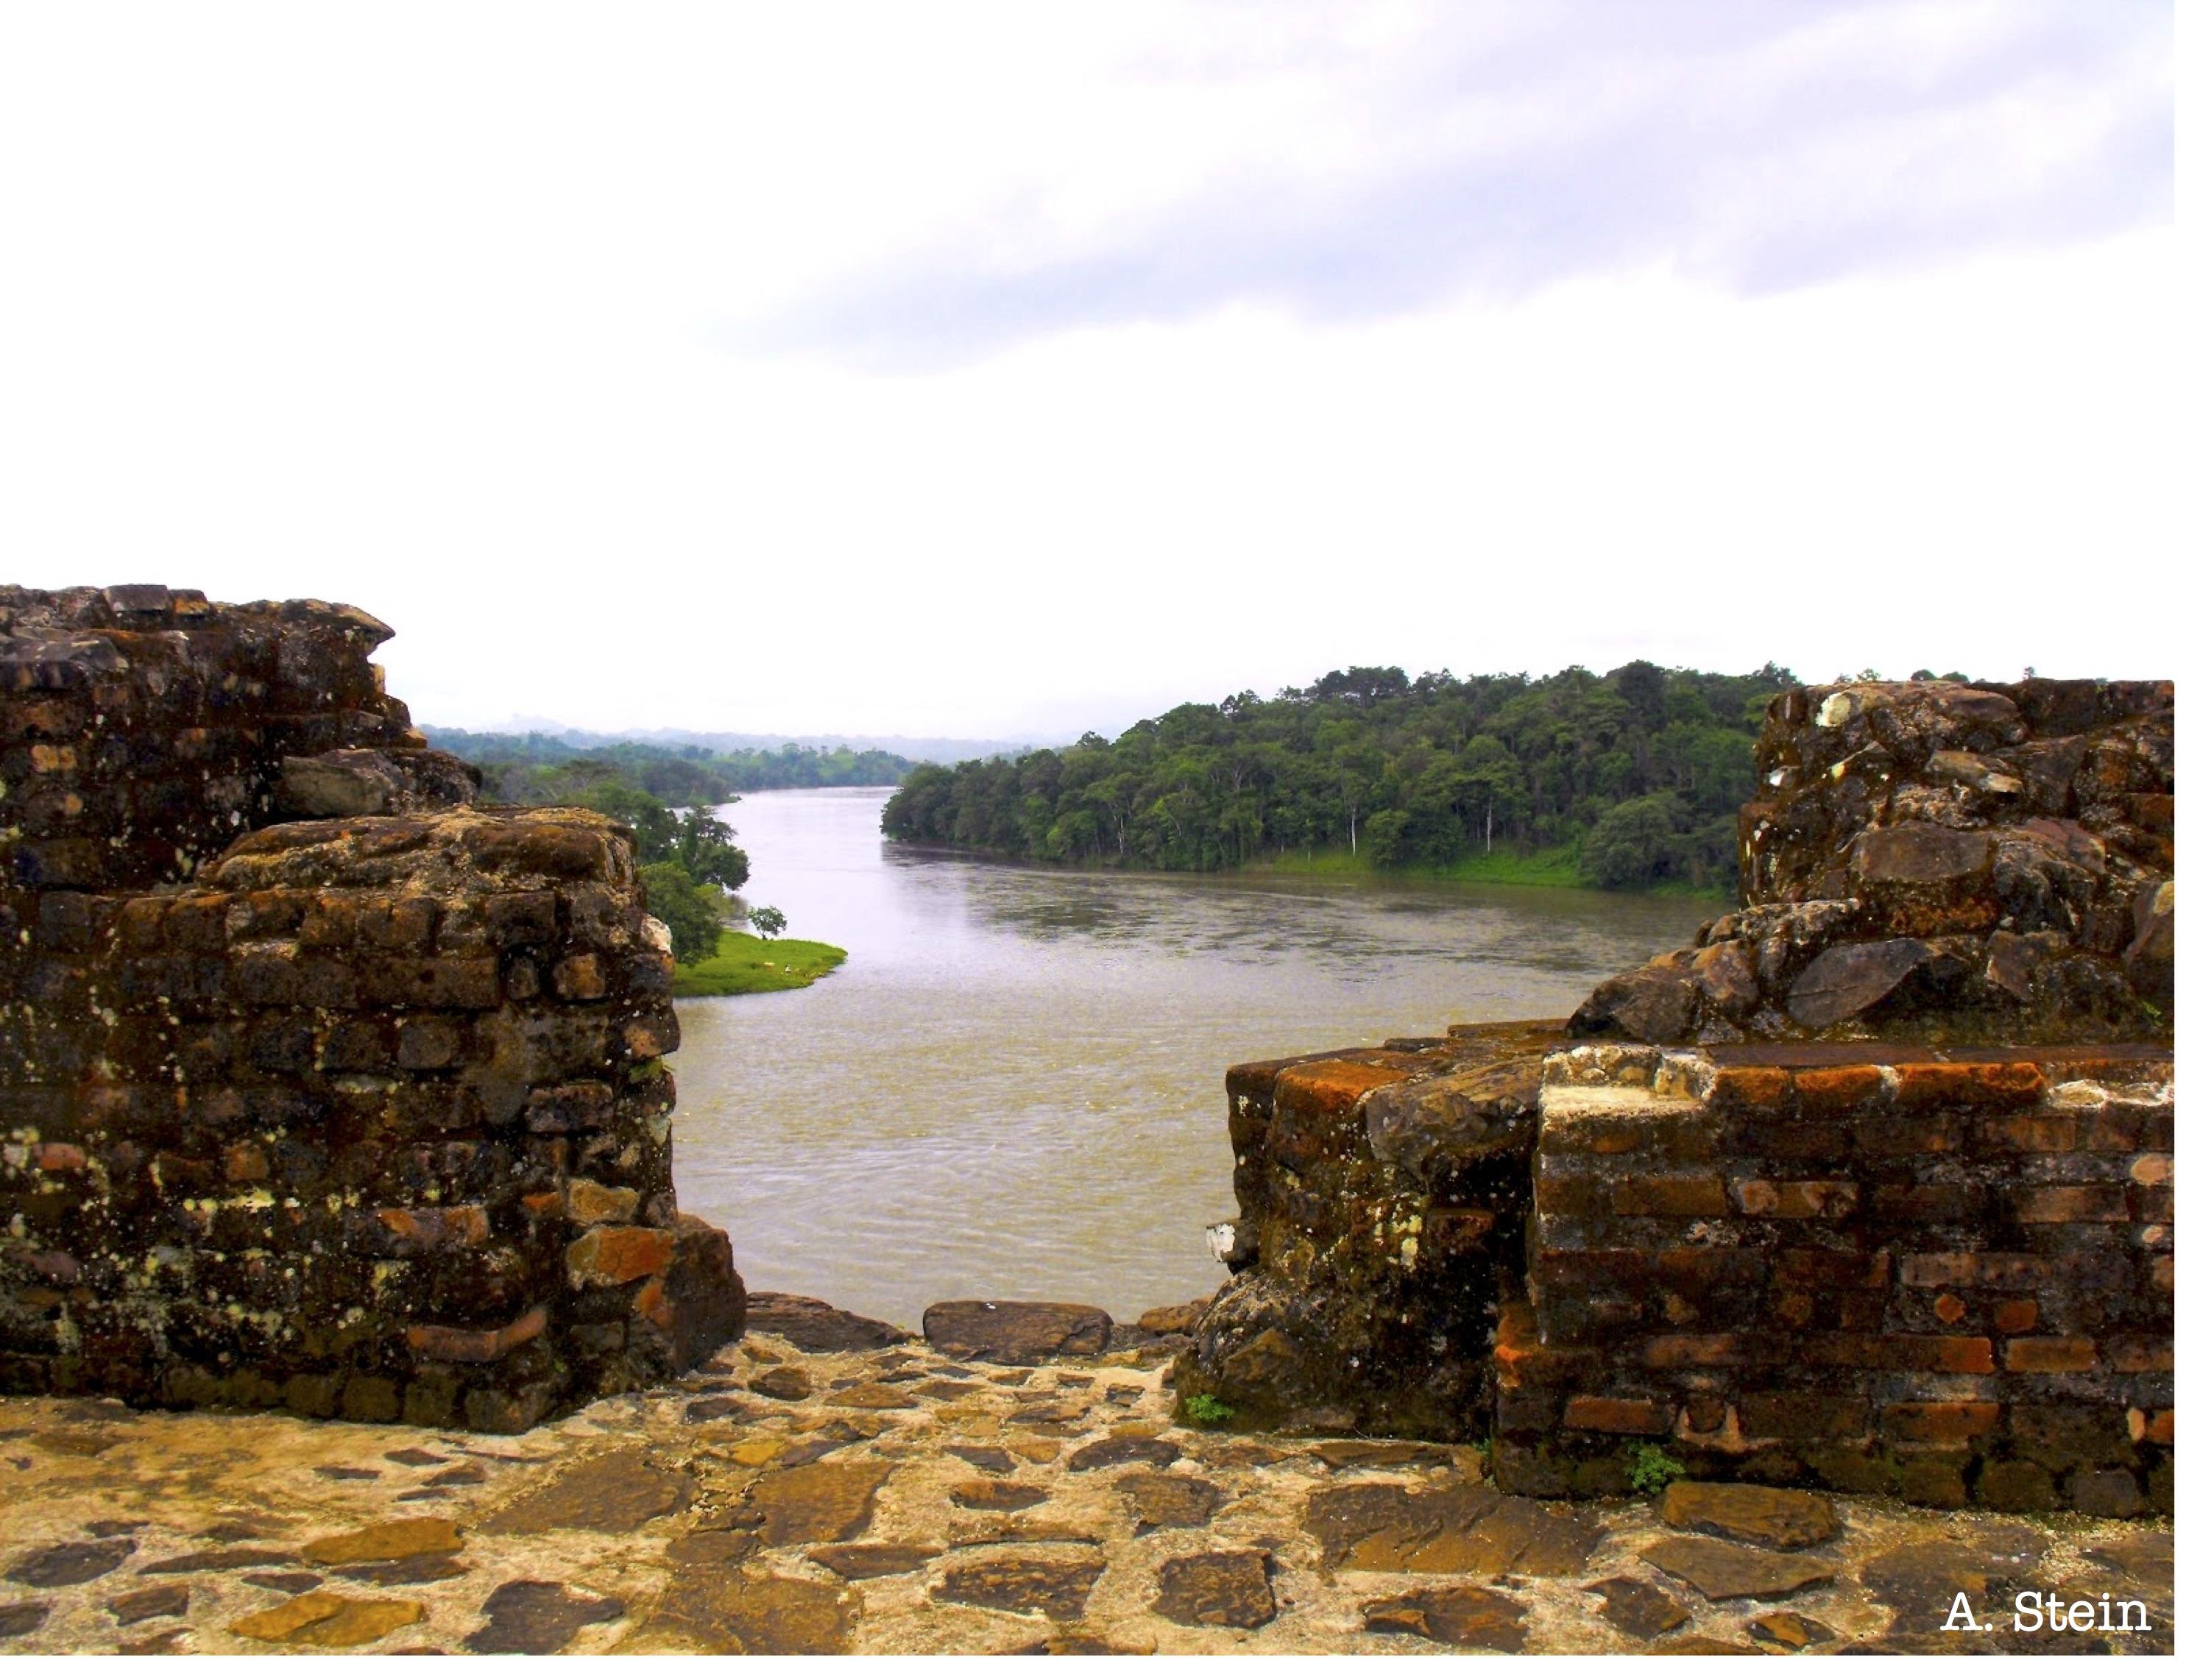 photo-1-a-view-form-el-castillo-along-the-rio-sjden